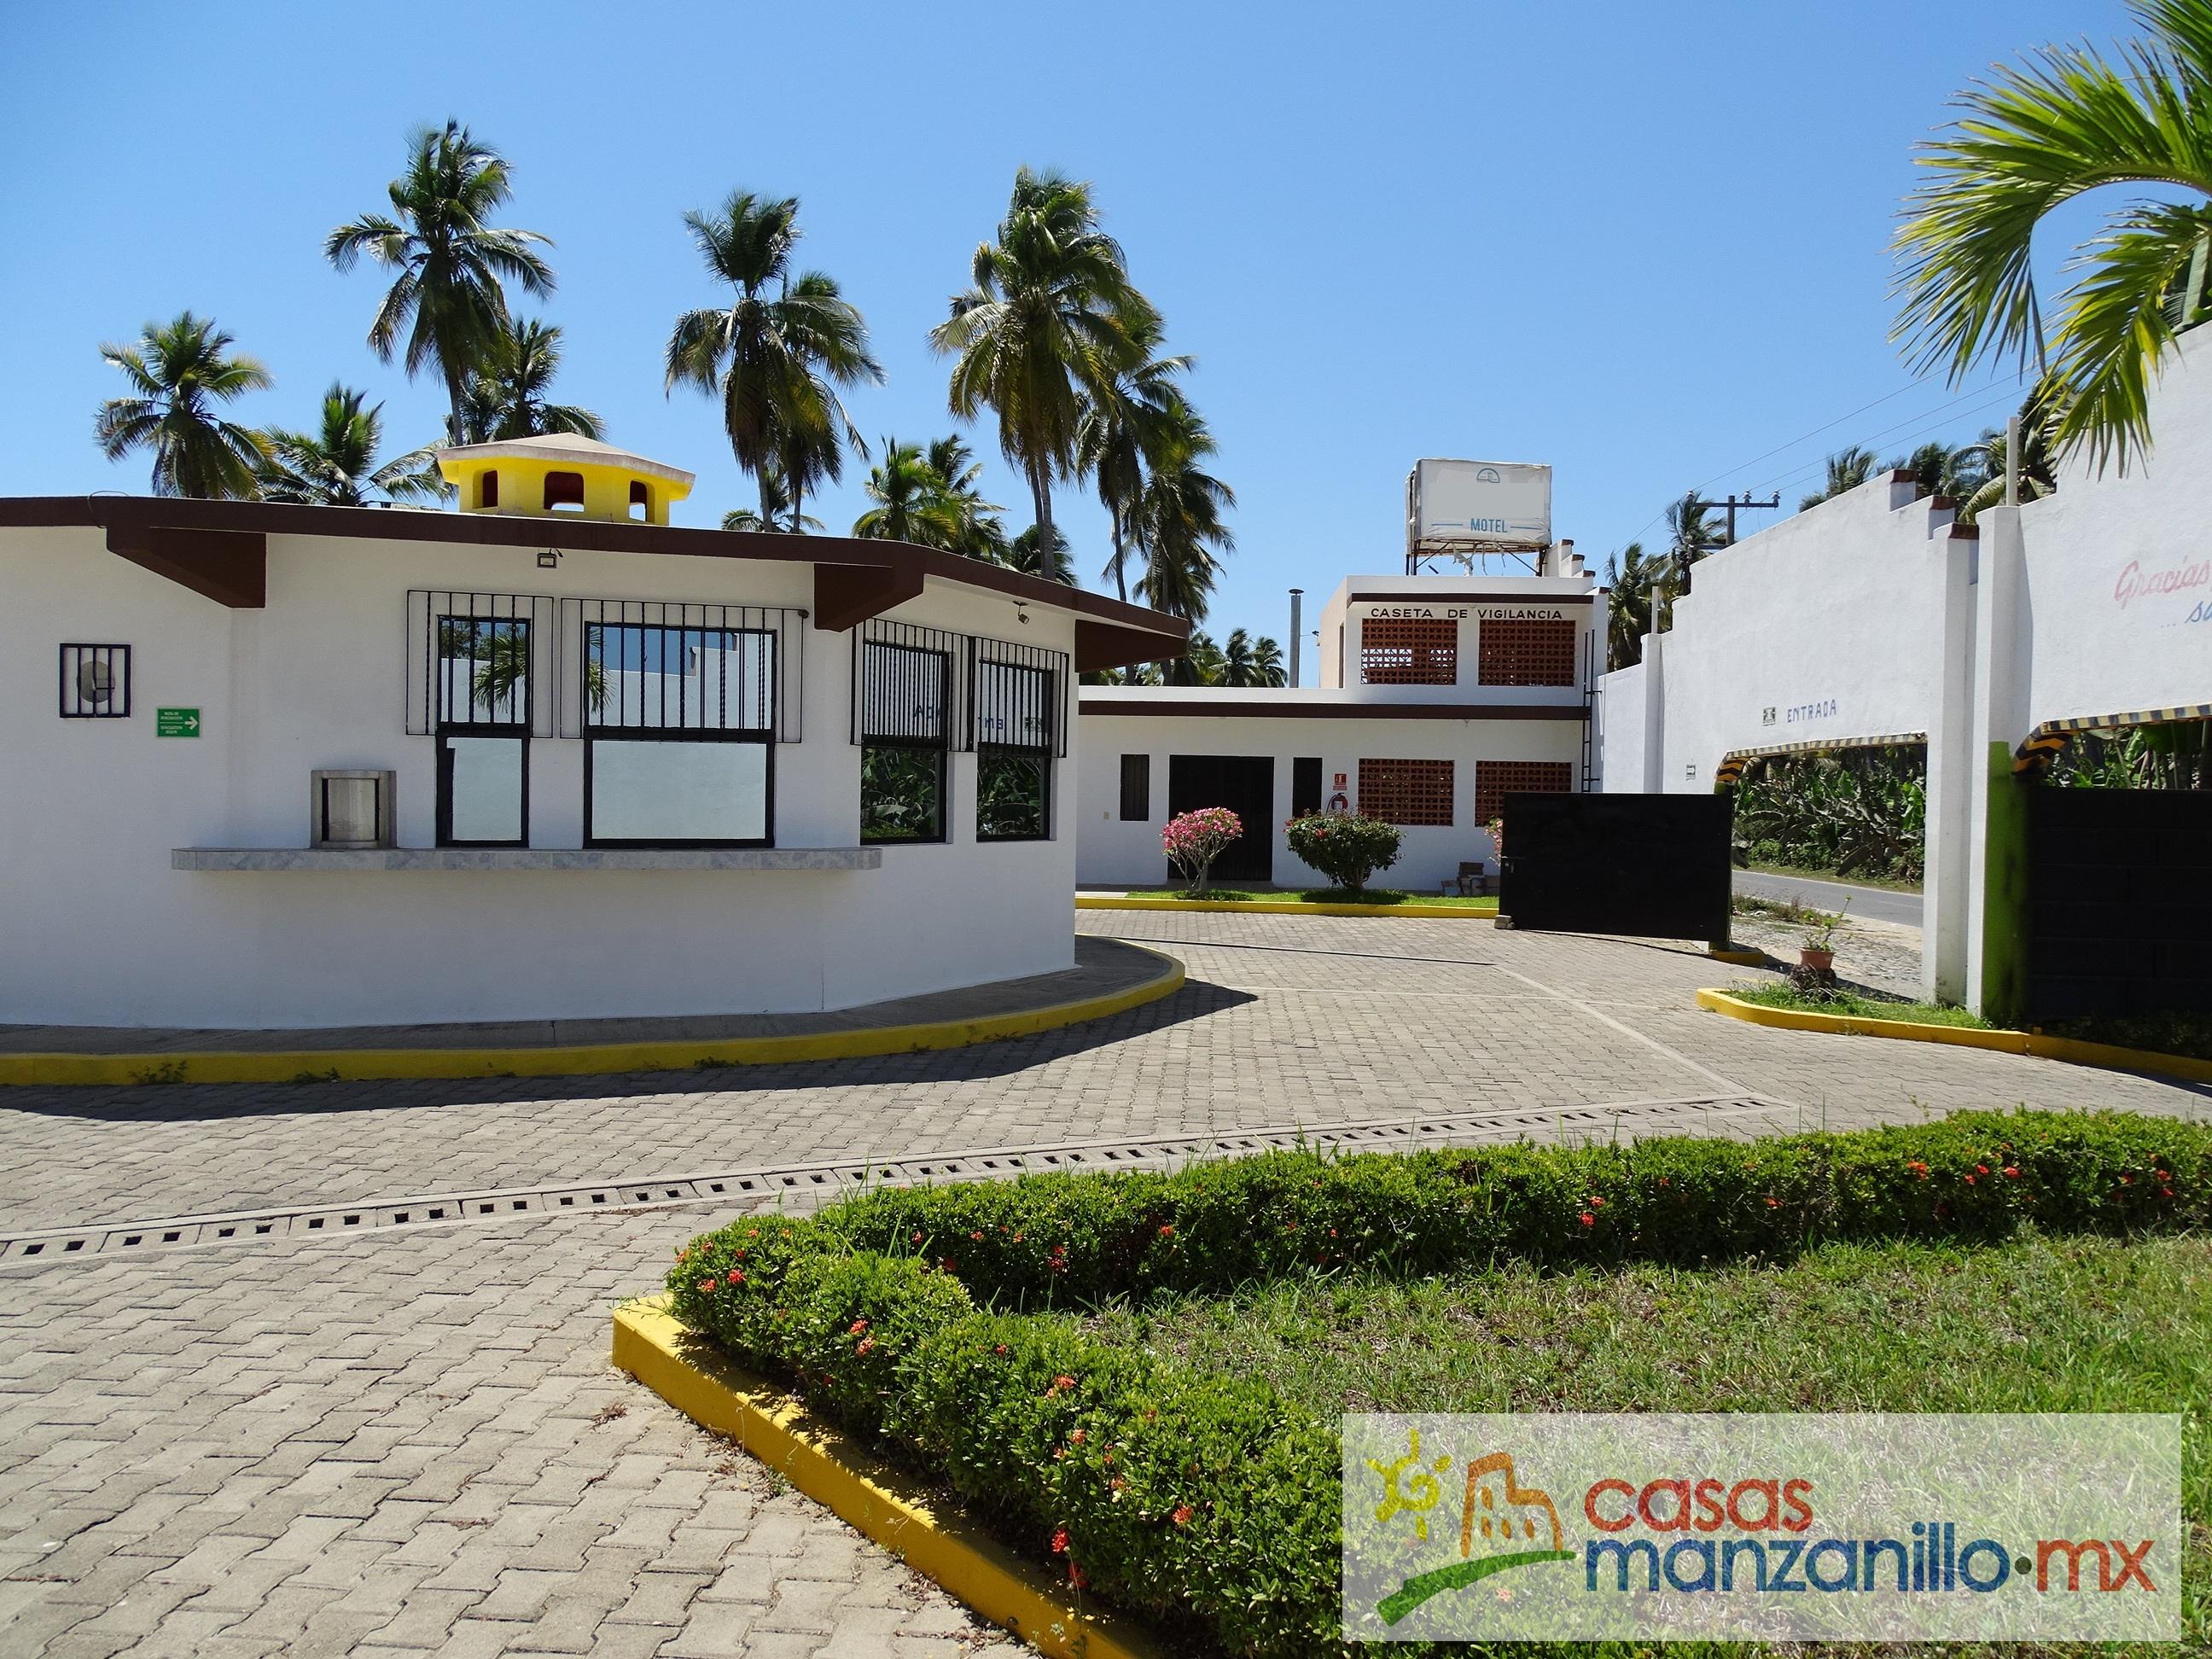 Motel VENTA Manzanillo - Dunas (10)